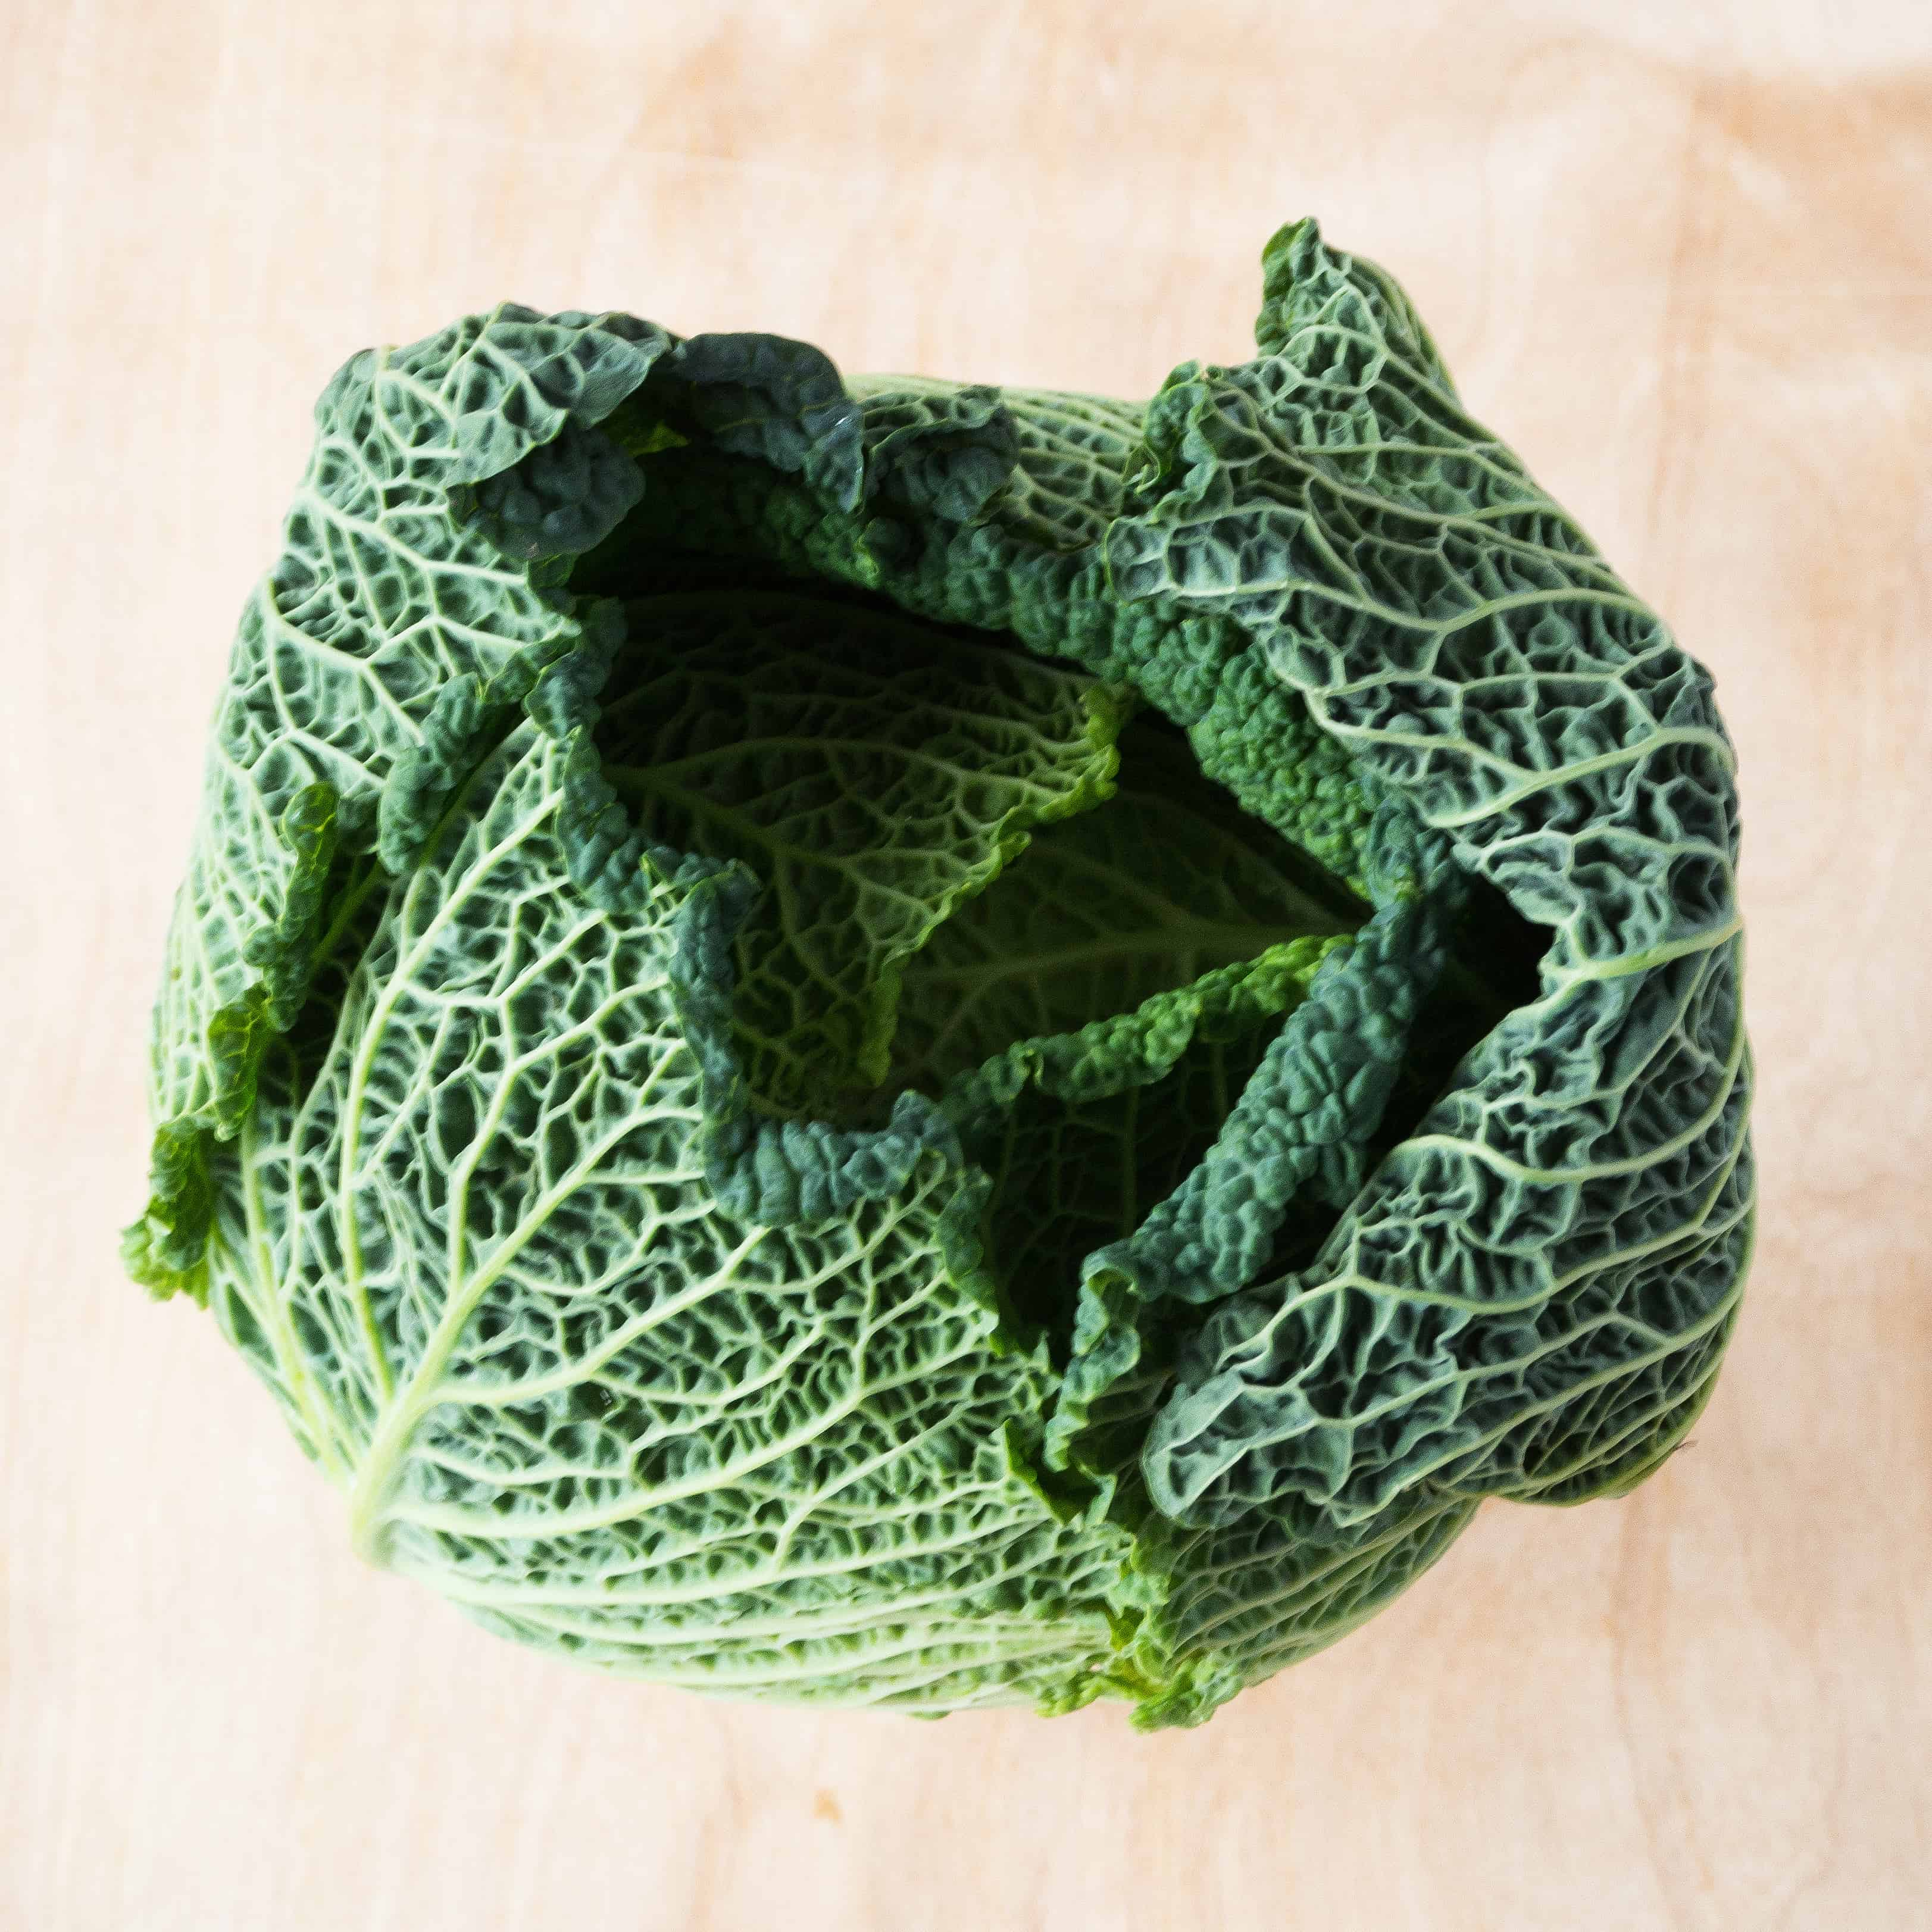 Savoy Cabbage - December Seasonal Produce